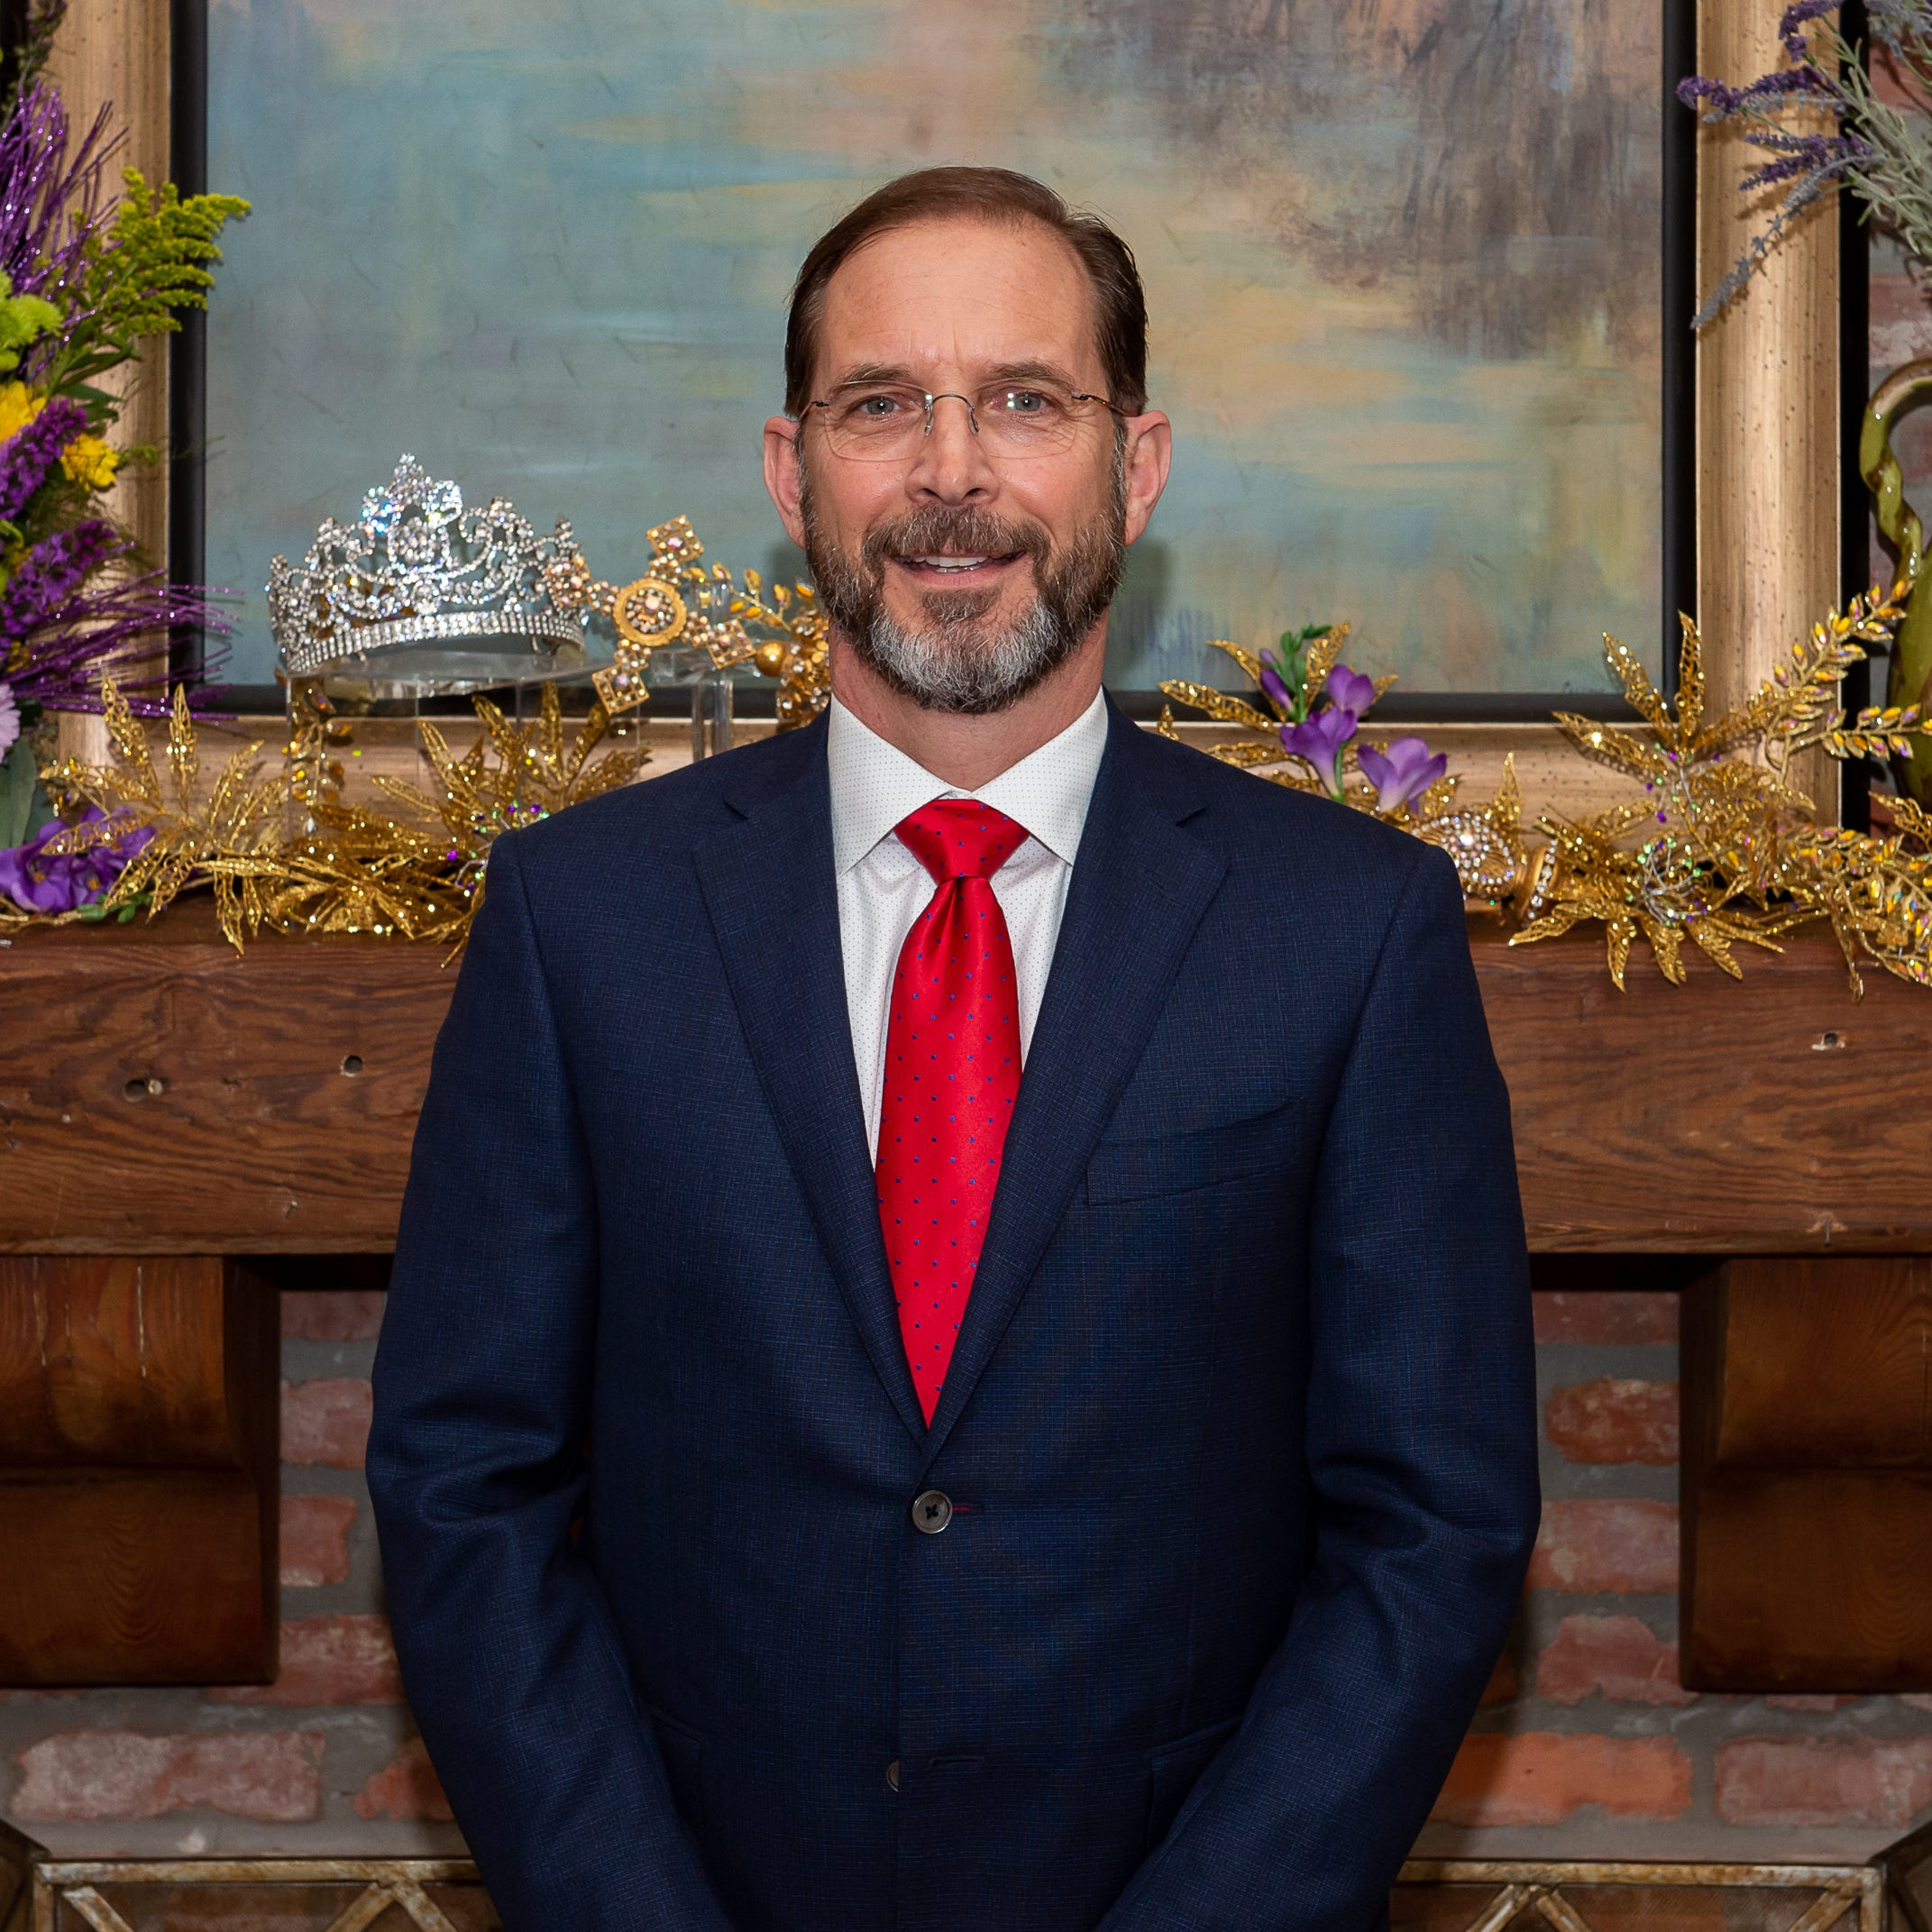 Meet the king of Mardi Gras, King Gabriel, Dr. Thomas Montgomery